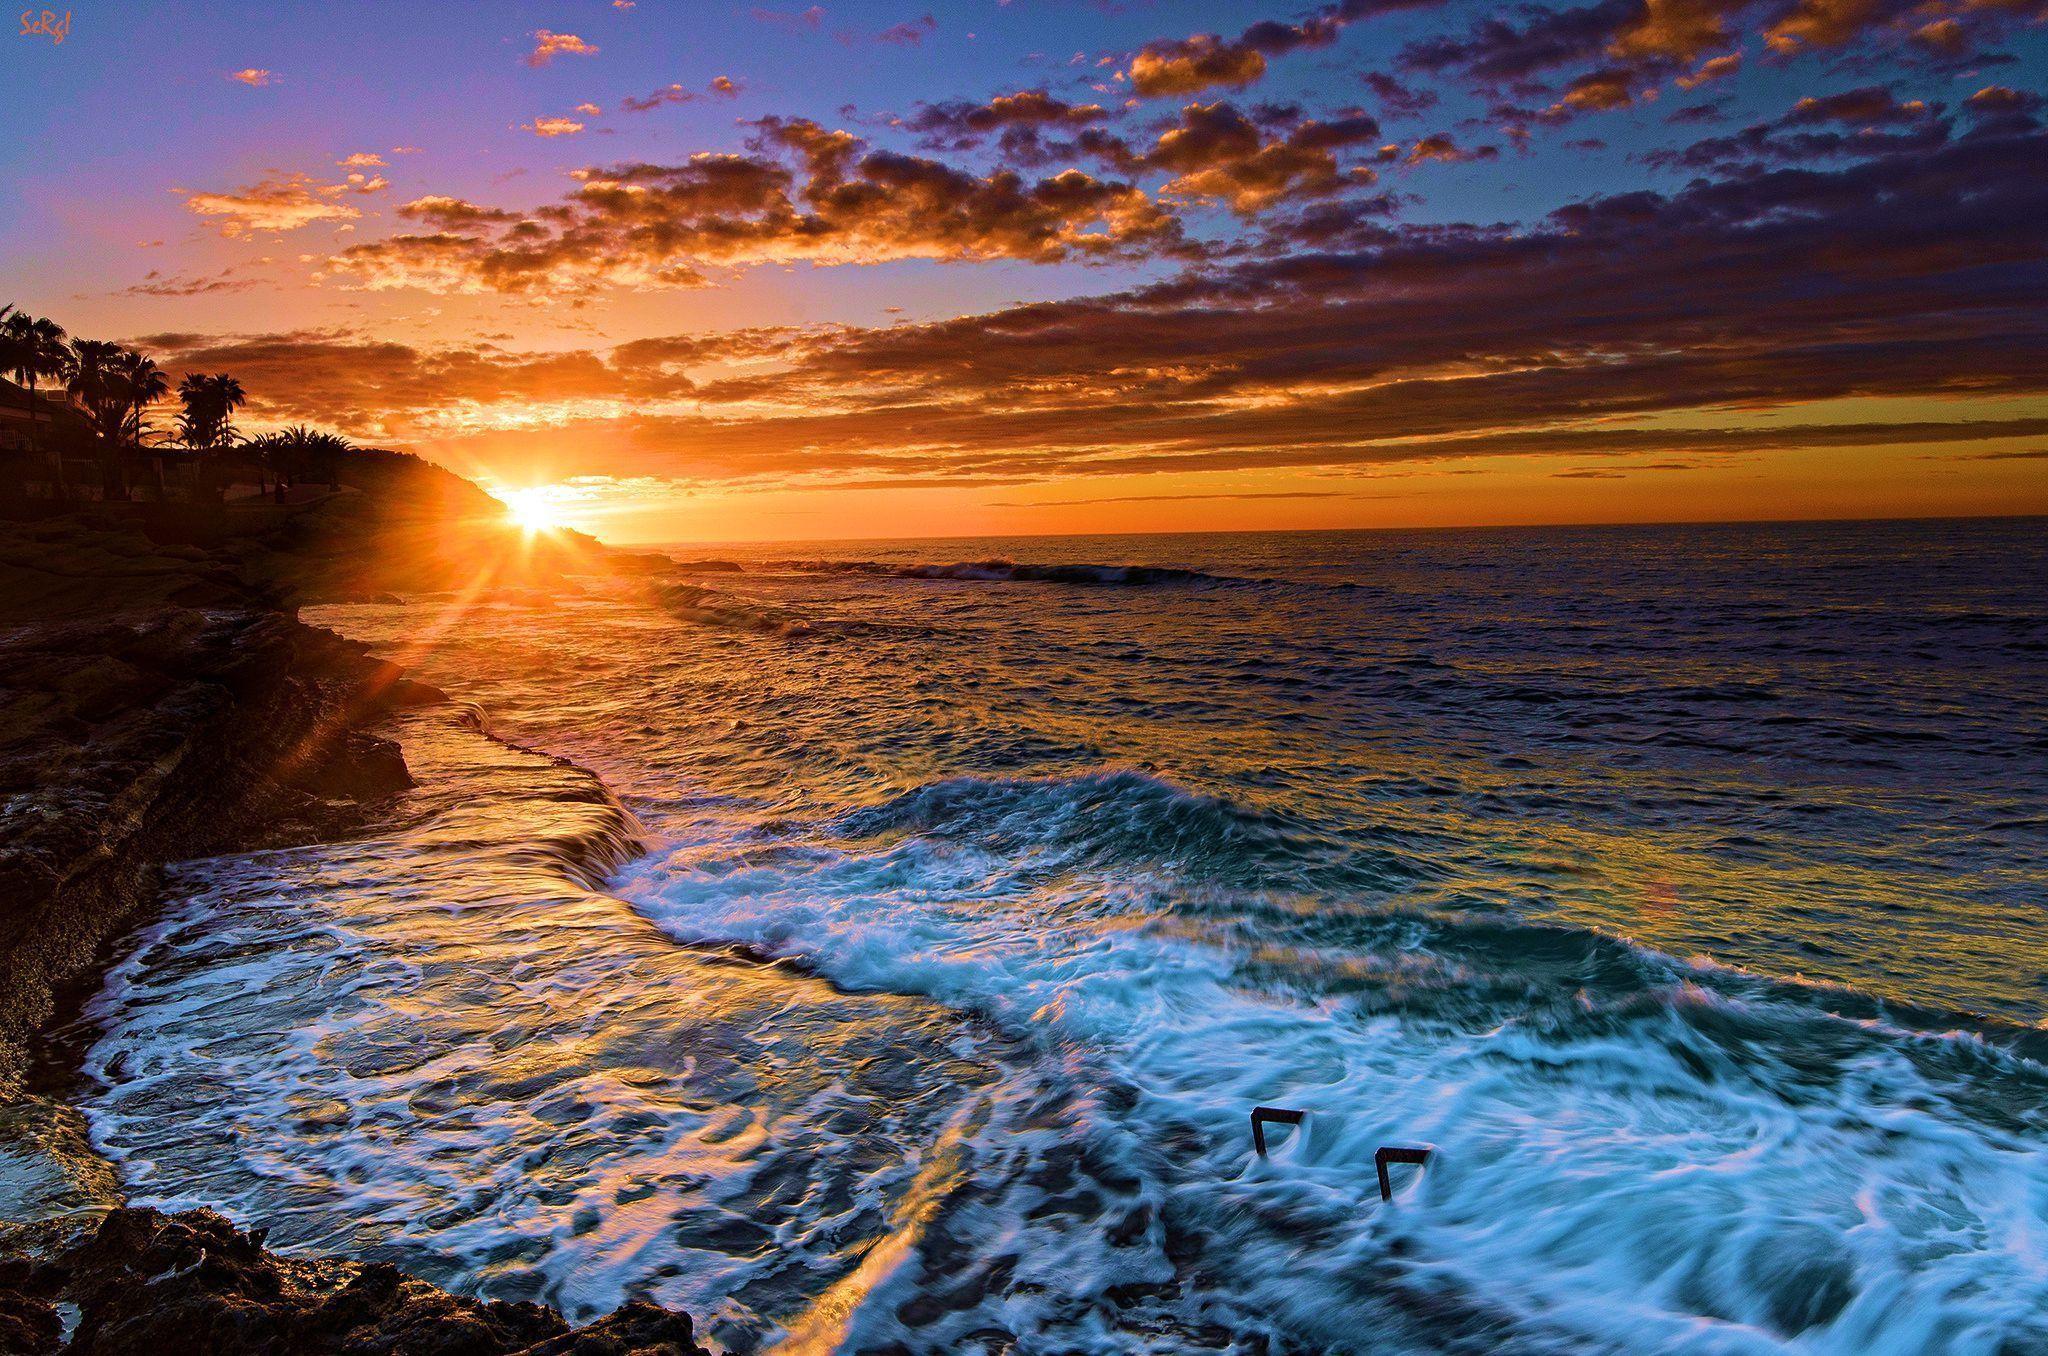 Beach Sunset Background Hd Background Wallpaper 16 HD Wallpapers .